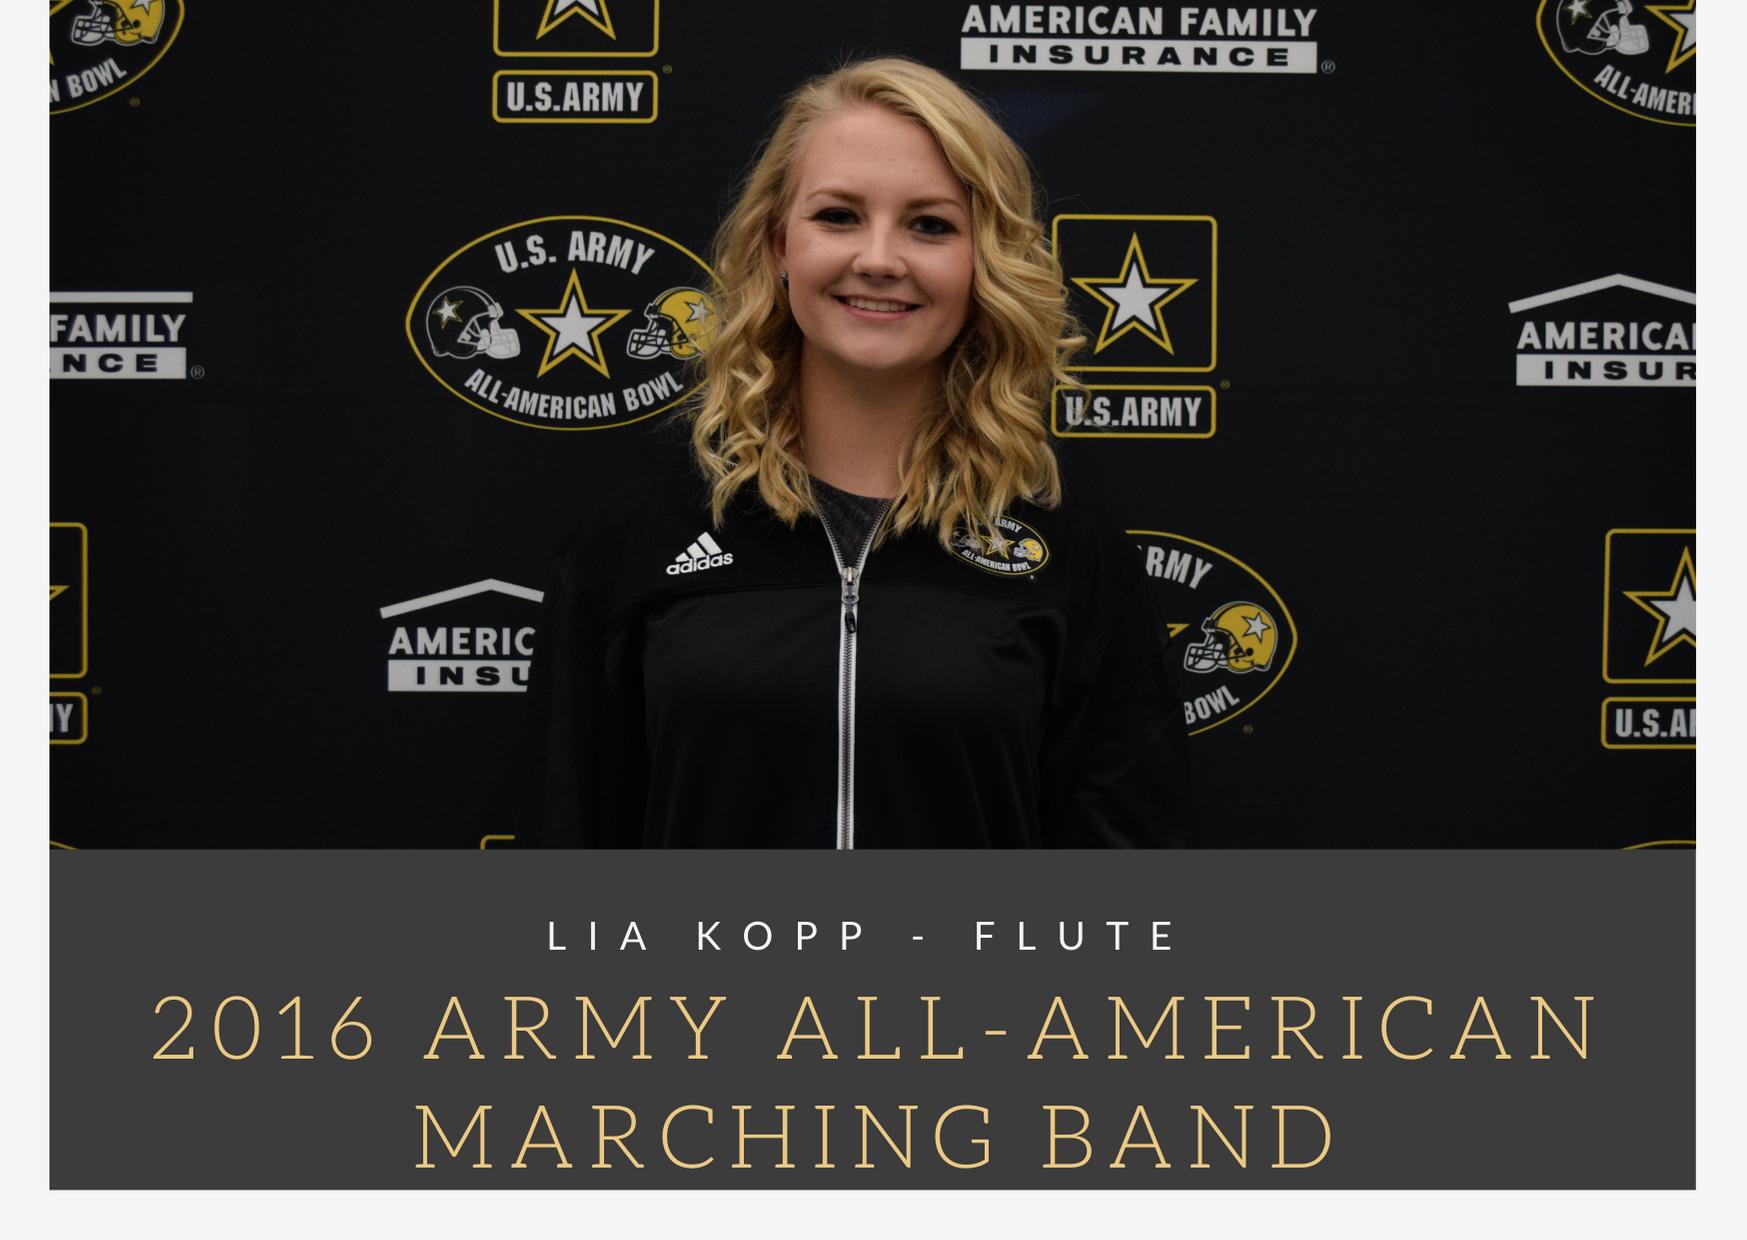 All American Band